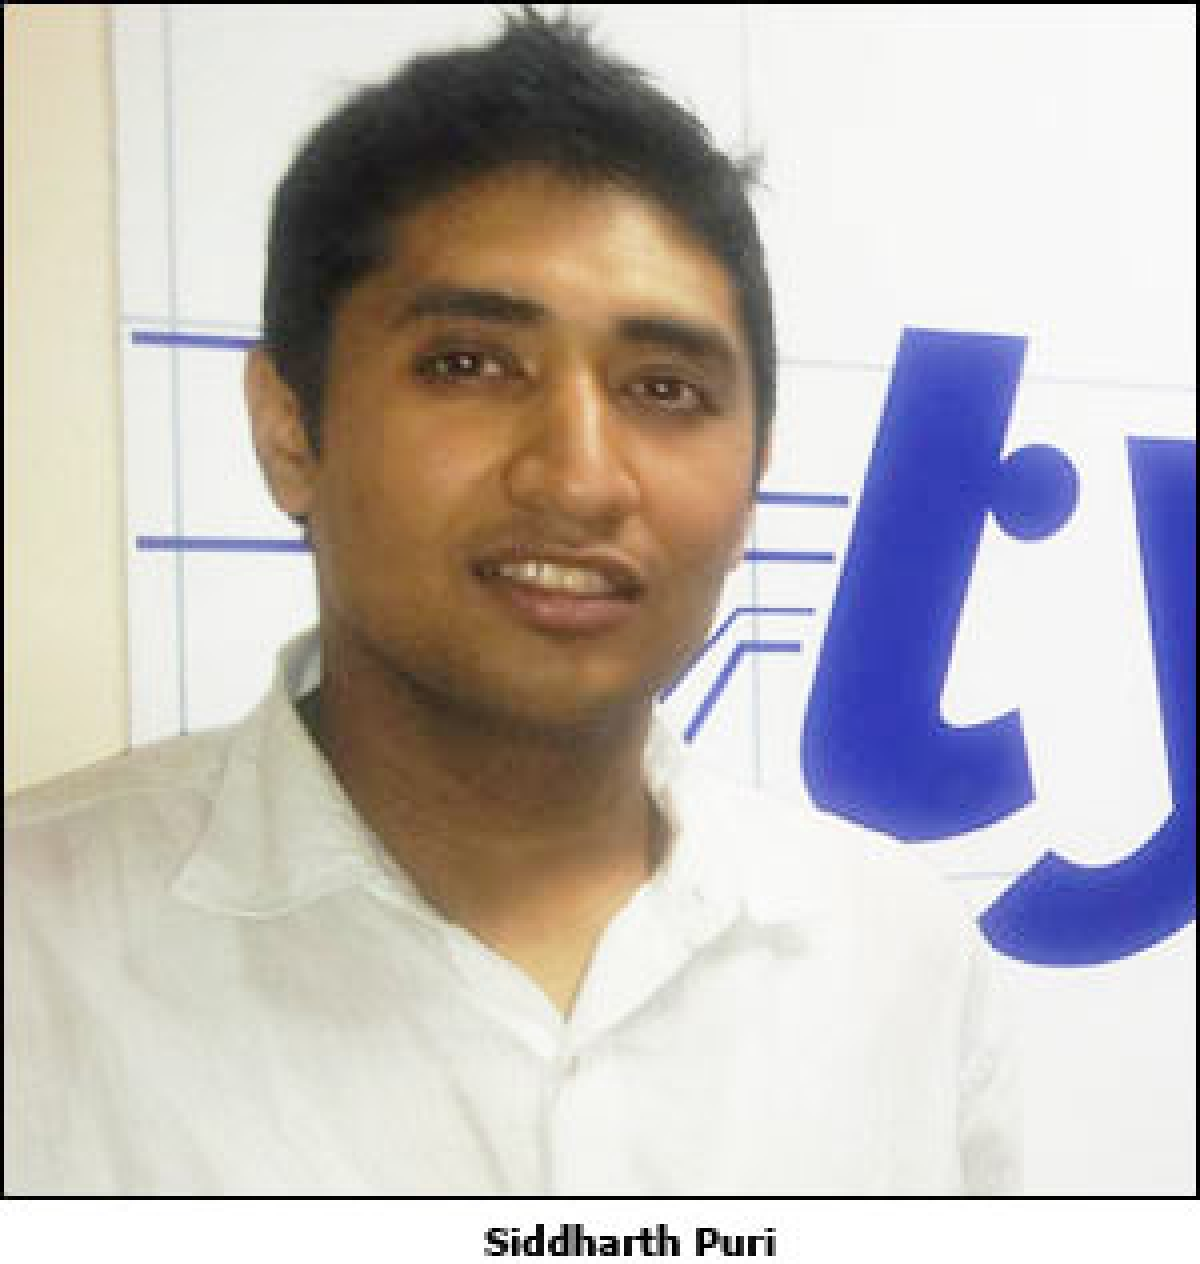 Tyroo Media makes key level appointments